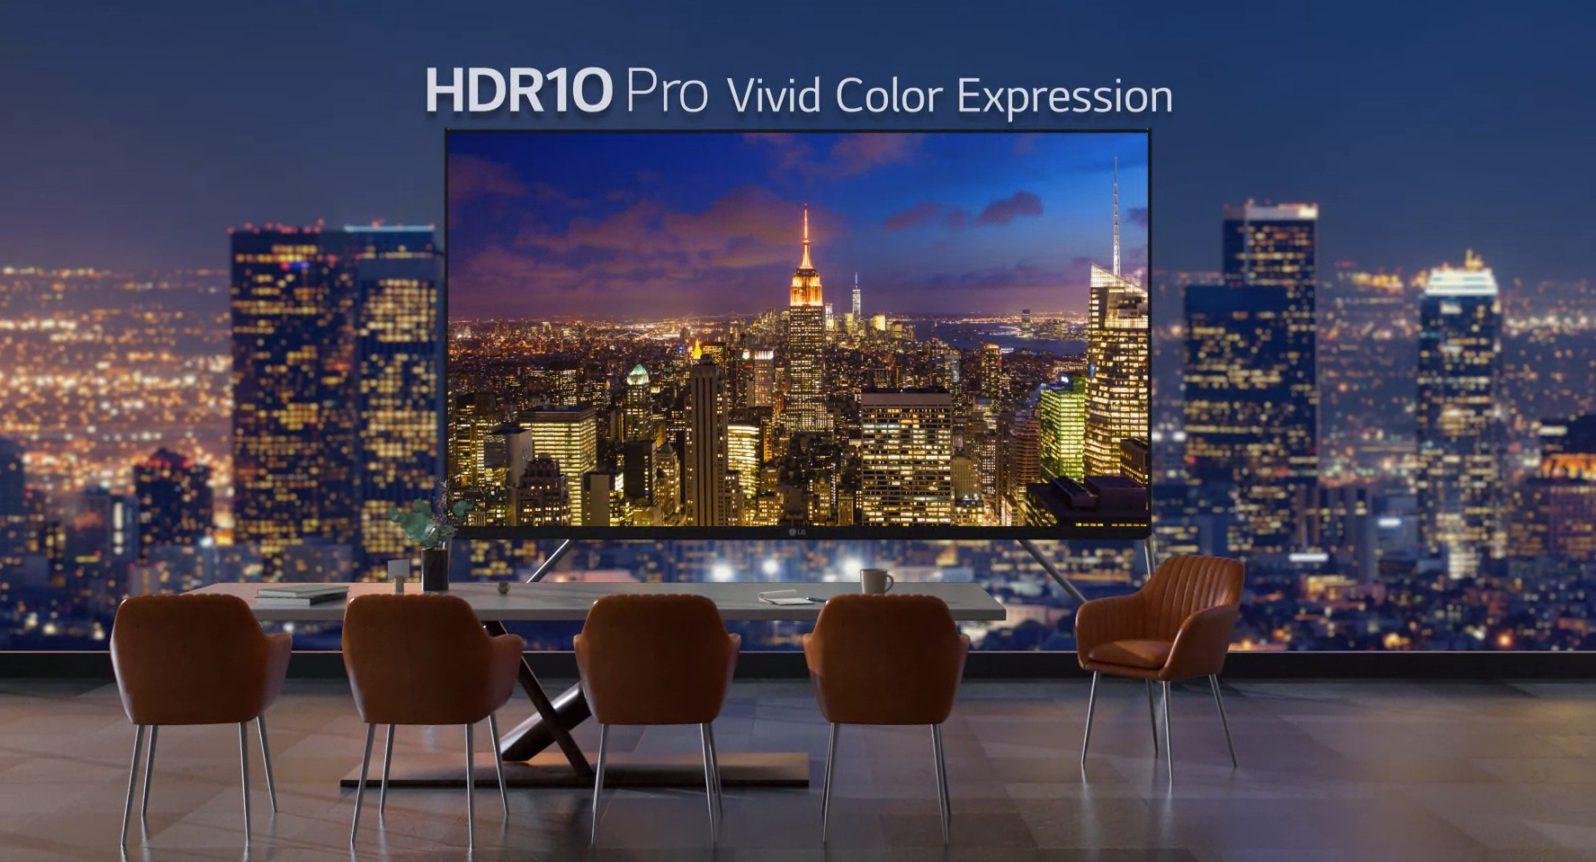 hdr10 pro vivid color expression